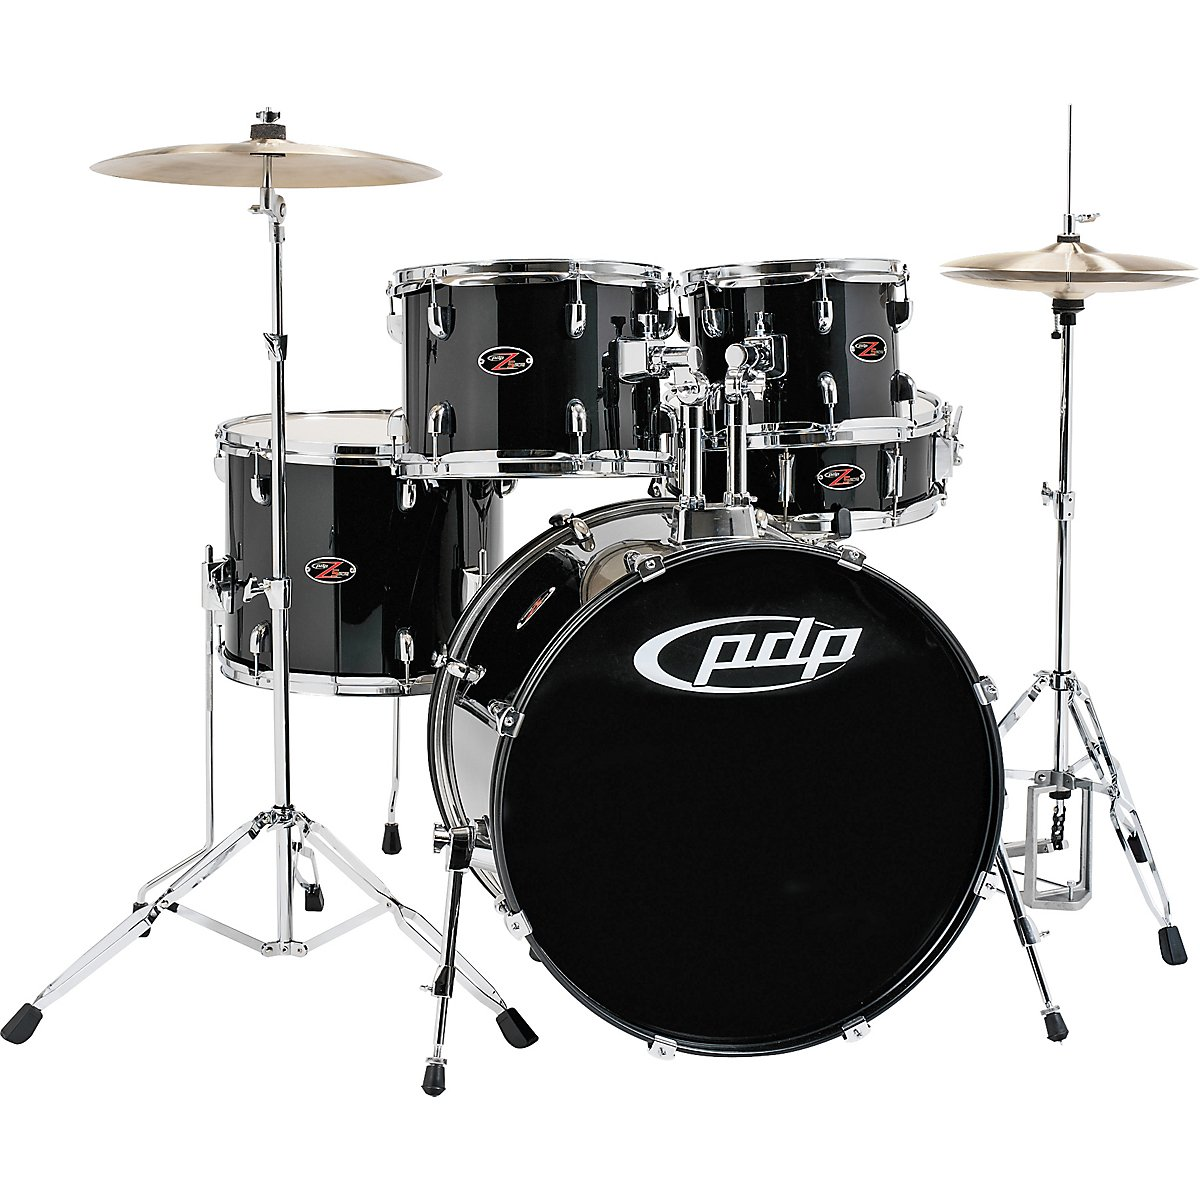 Black Cymbal Set Cymbals Carbon Black